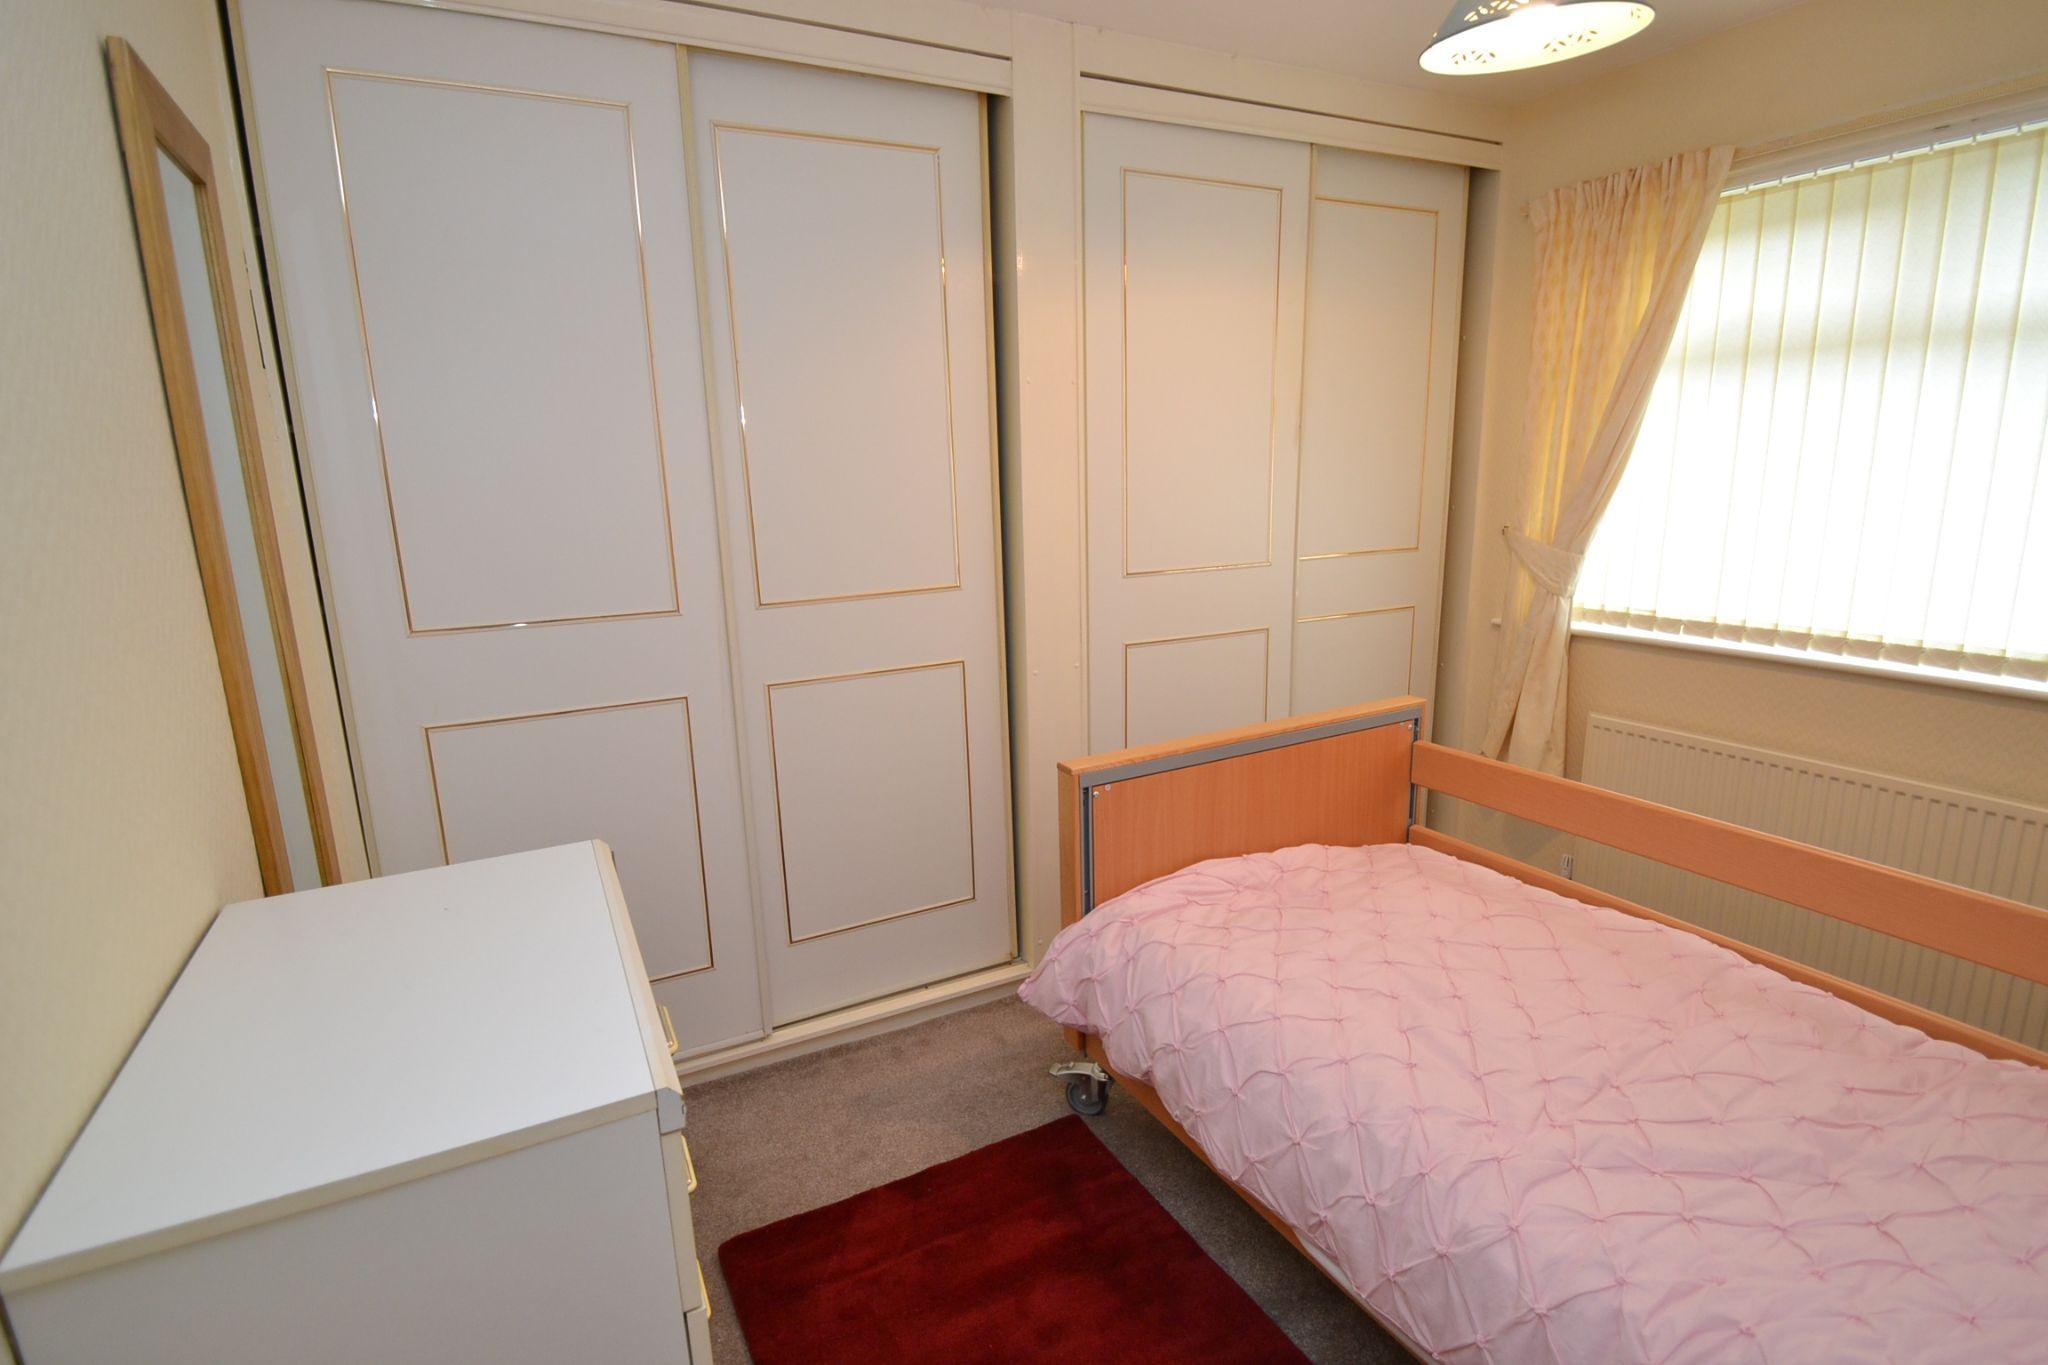 1 Bedroom Ground Floor Maisonette Flat/apartment For Sale - Photograph 8